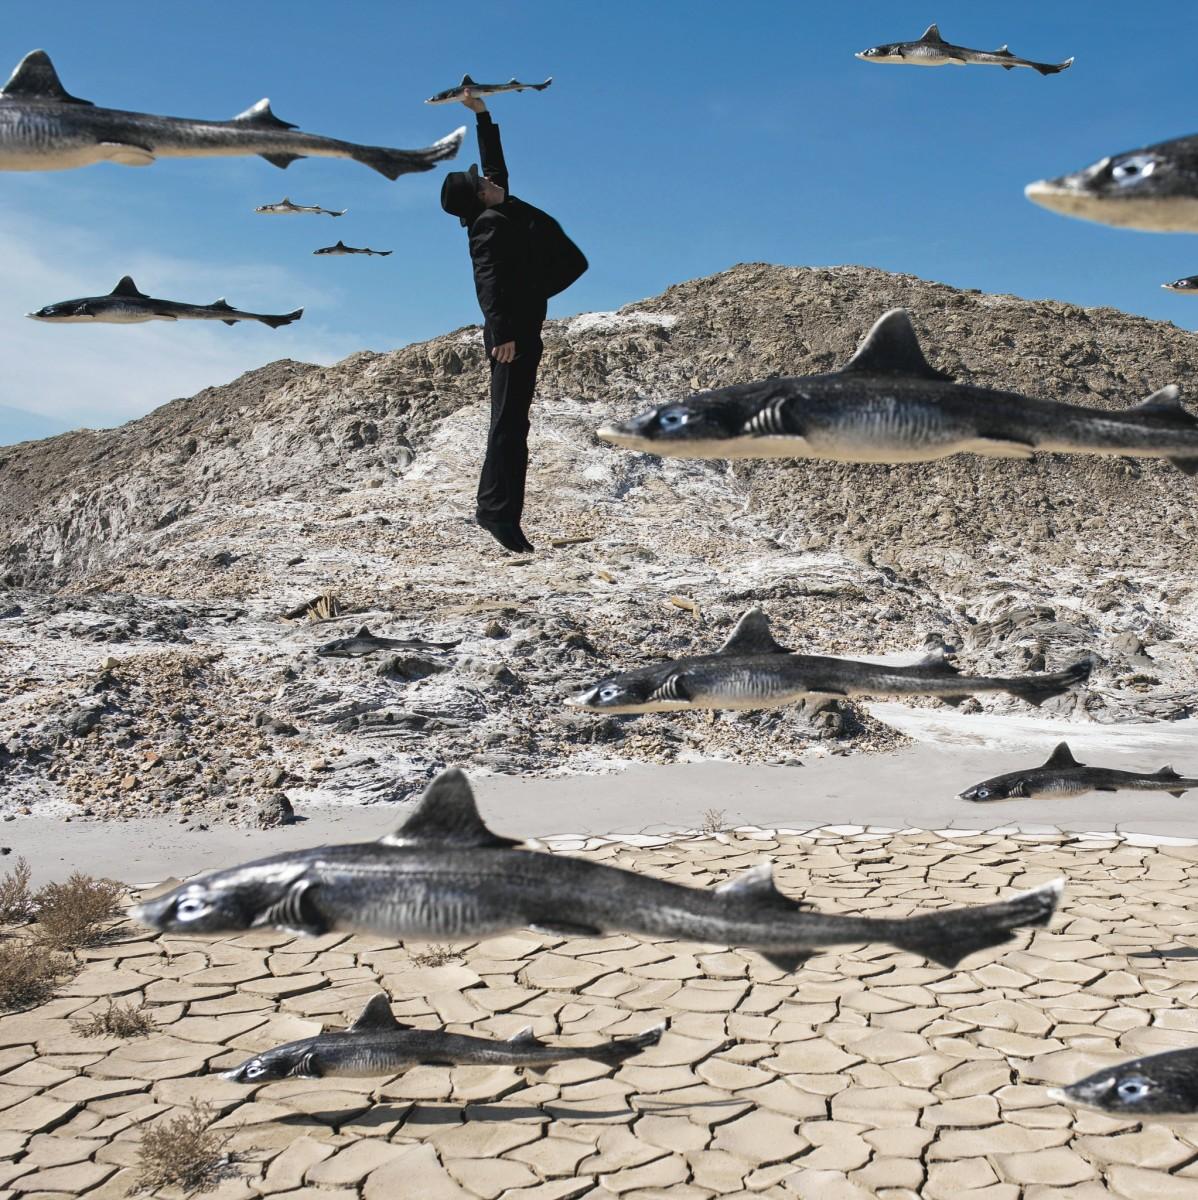 Quand les poissons auront des ailes   When fish start to fly   ? Quentin Bertoux / Agence VU